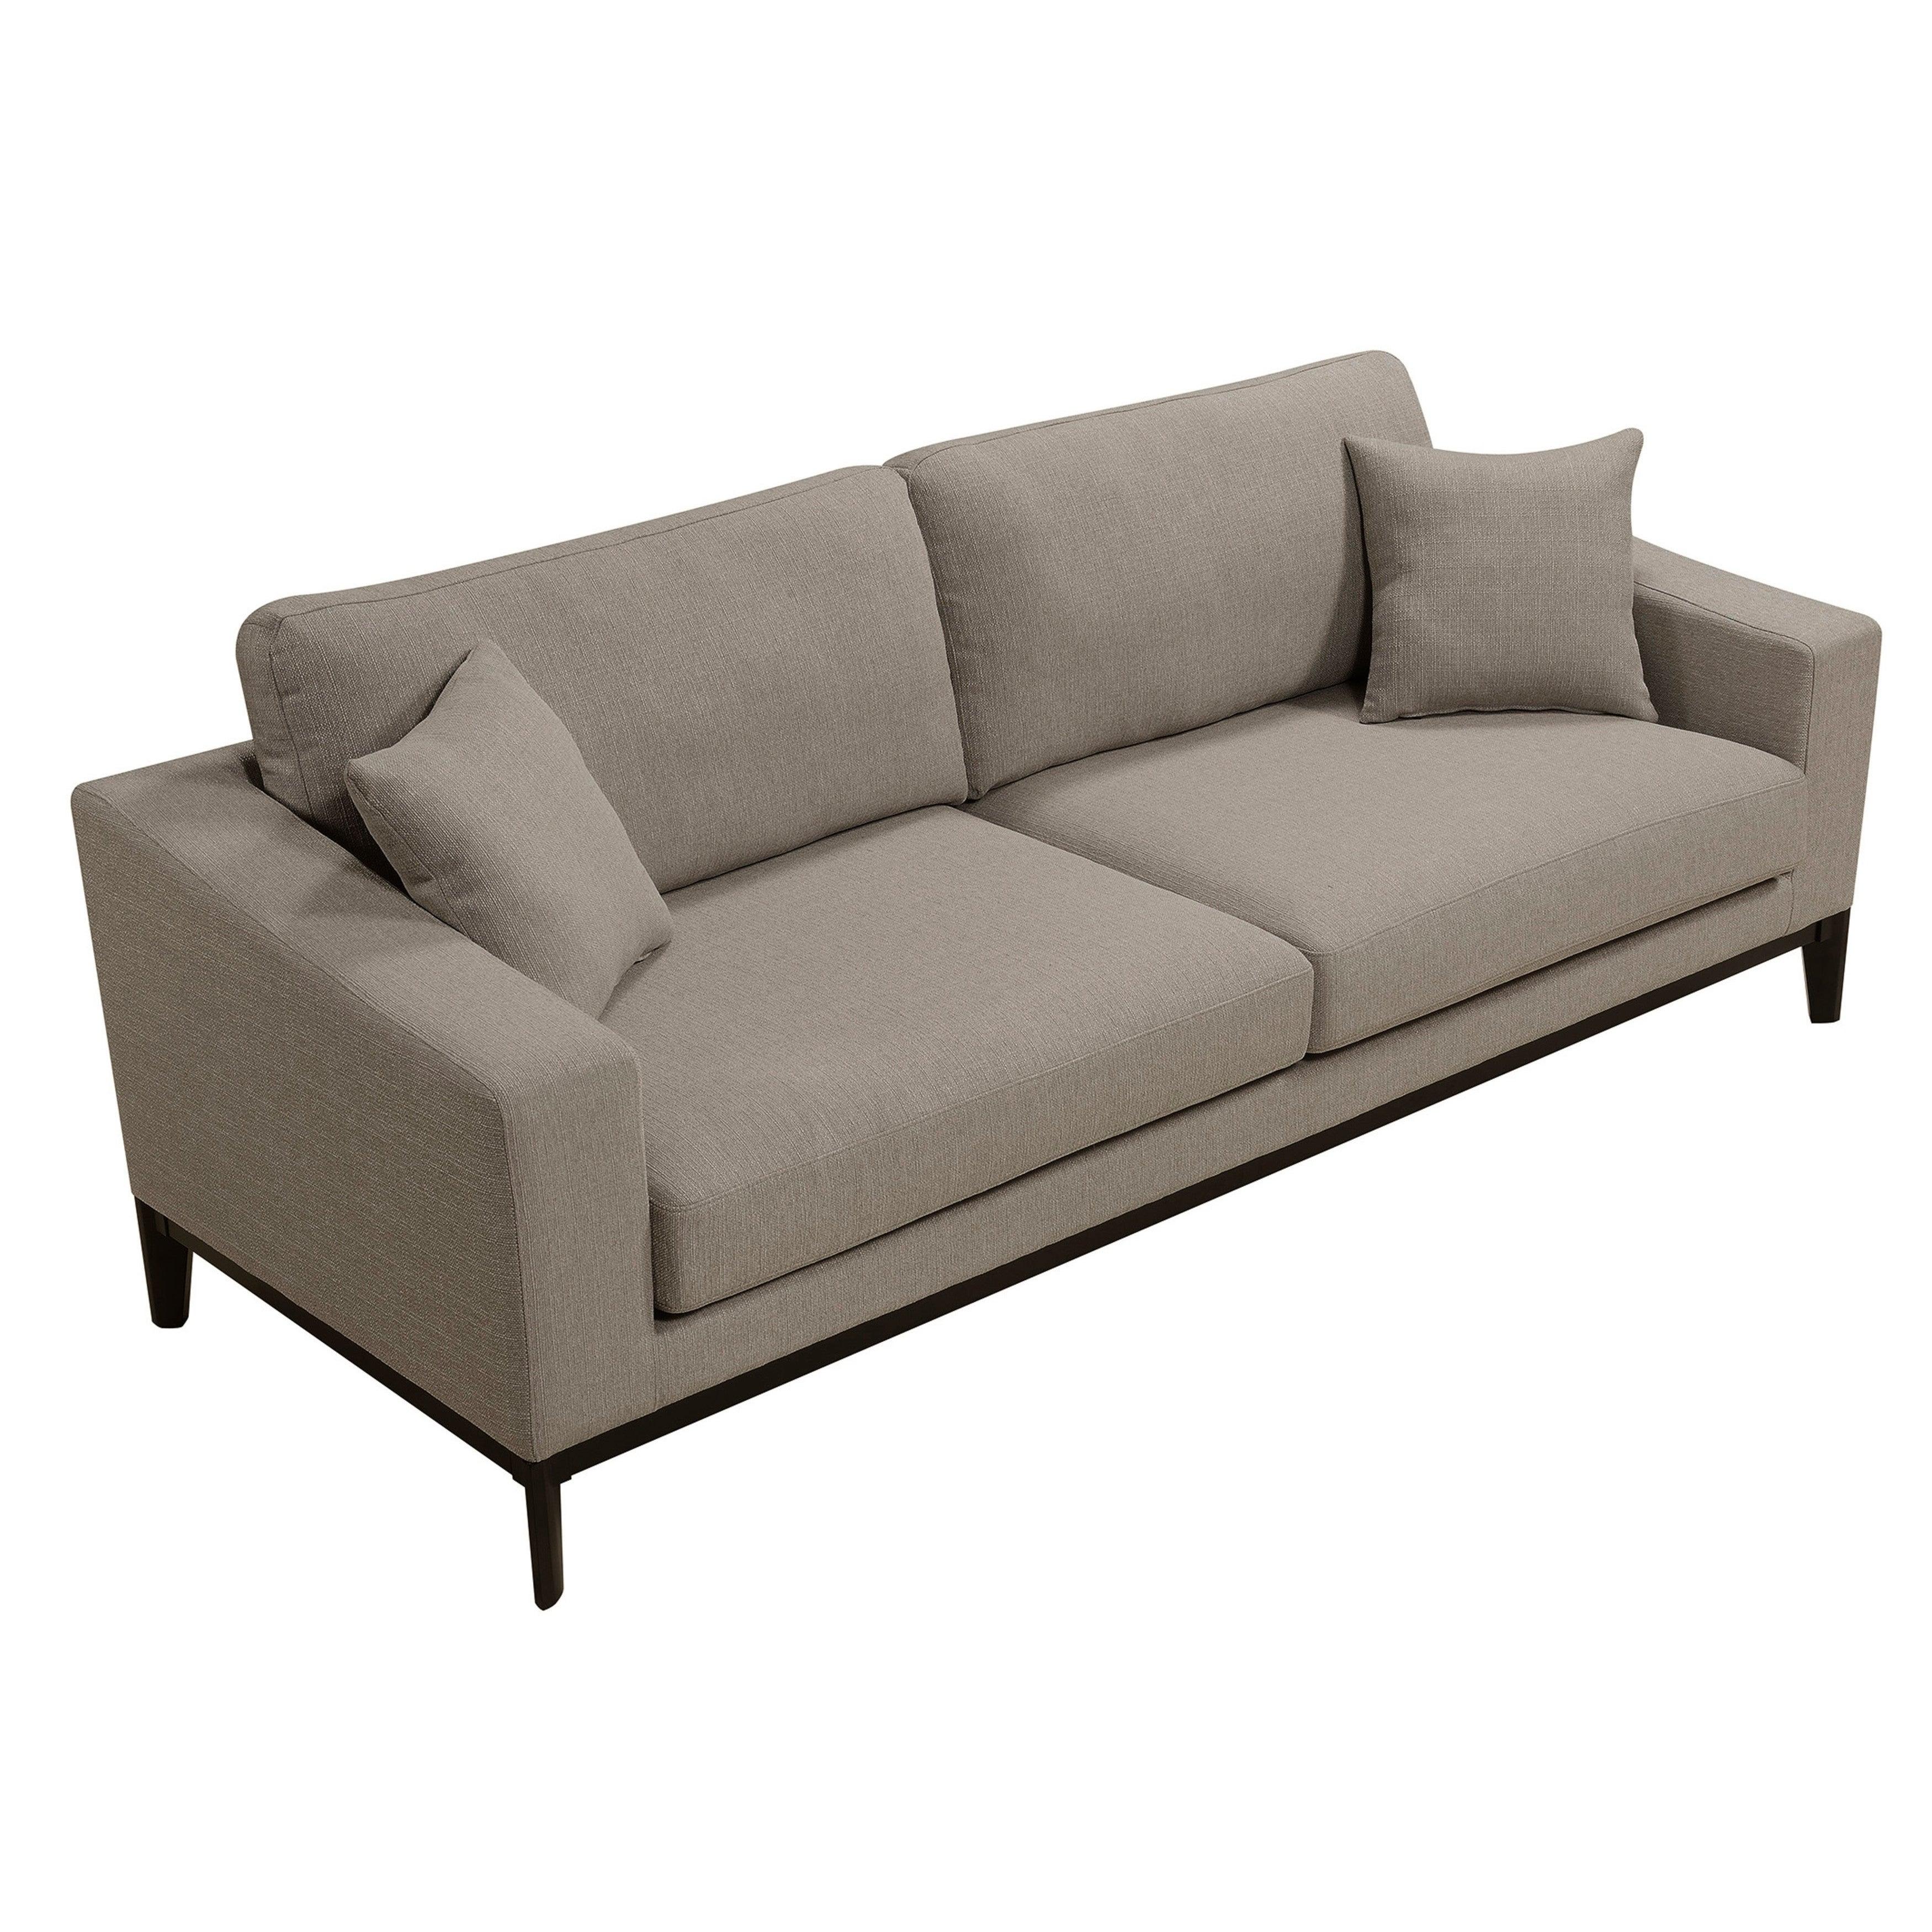 Elle Decor Olivia French Linen Sofa